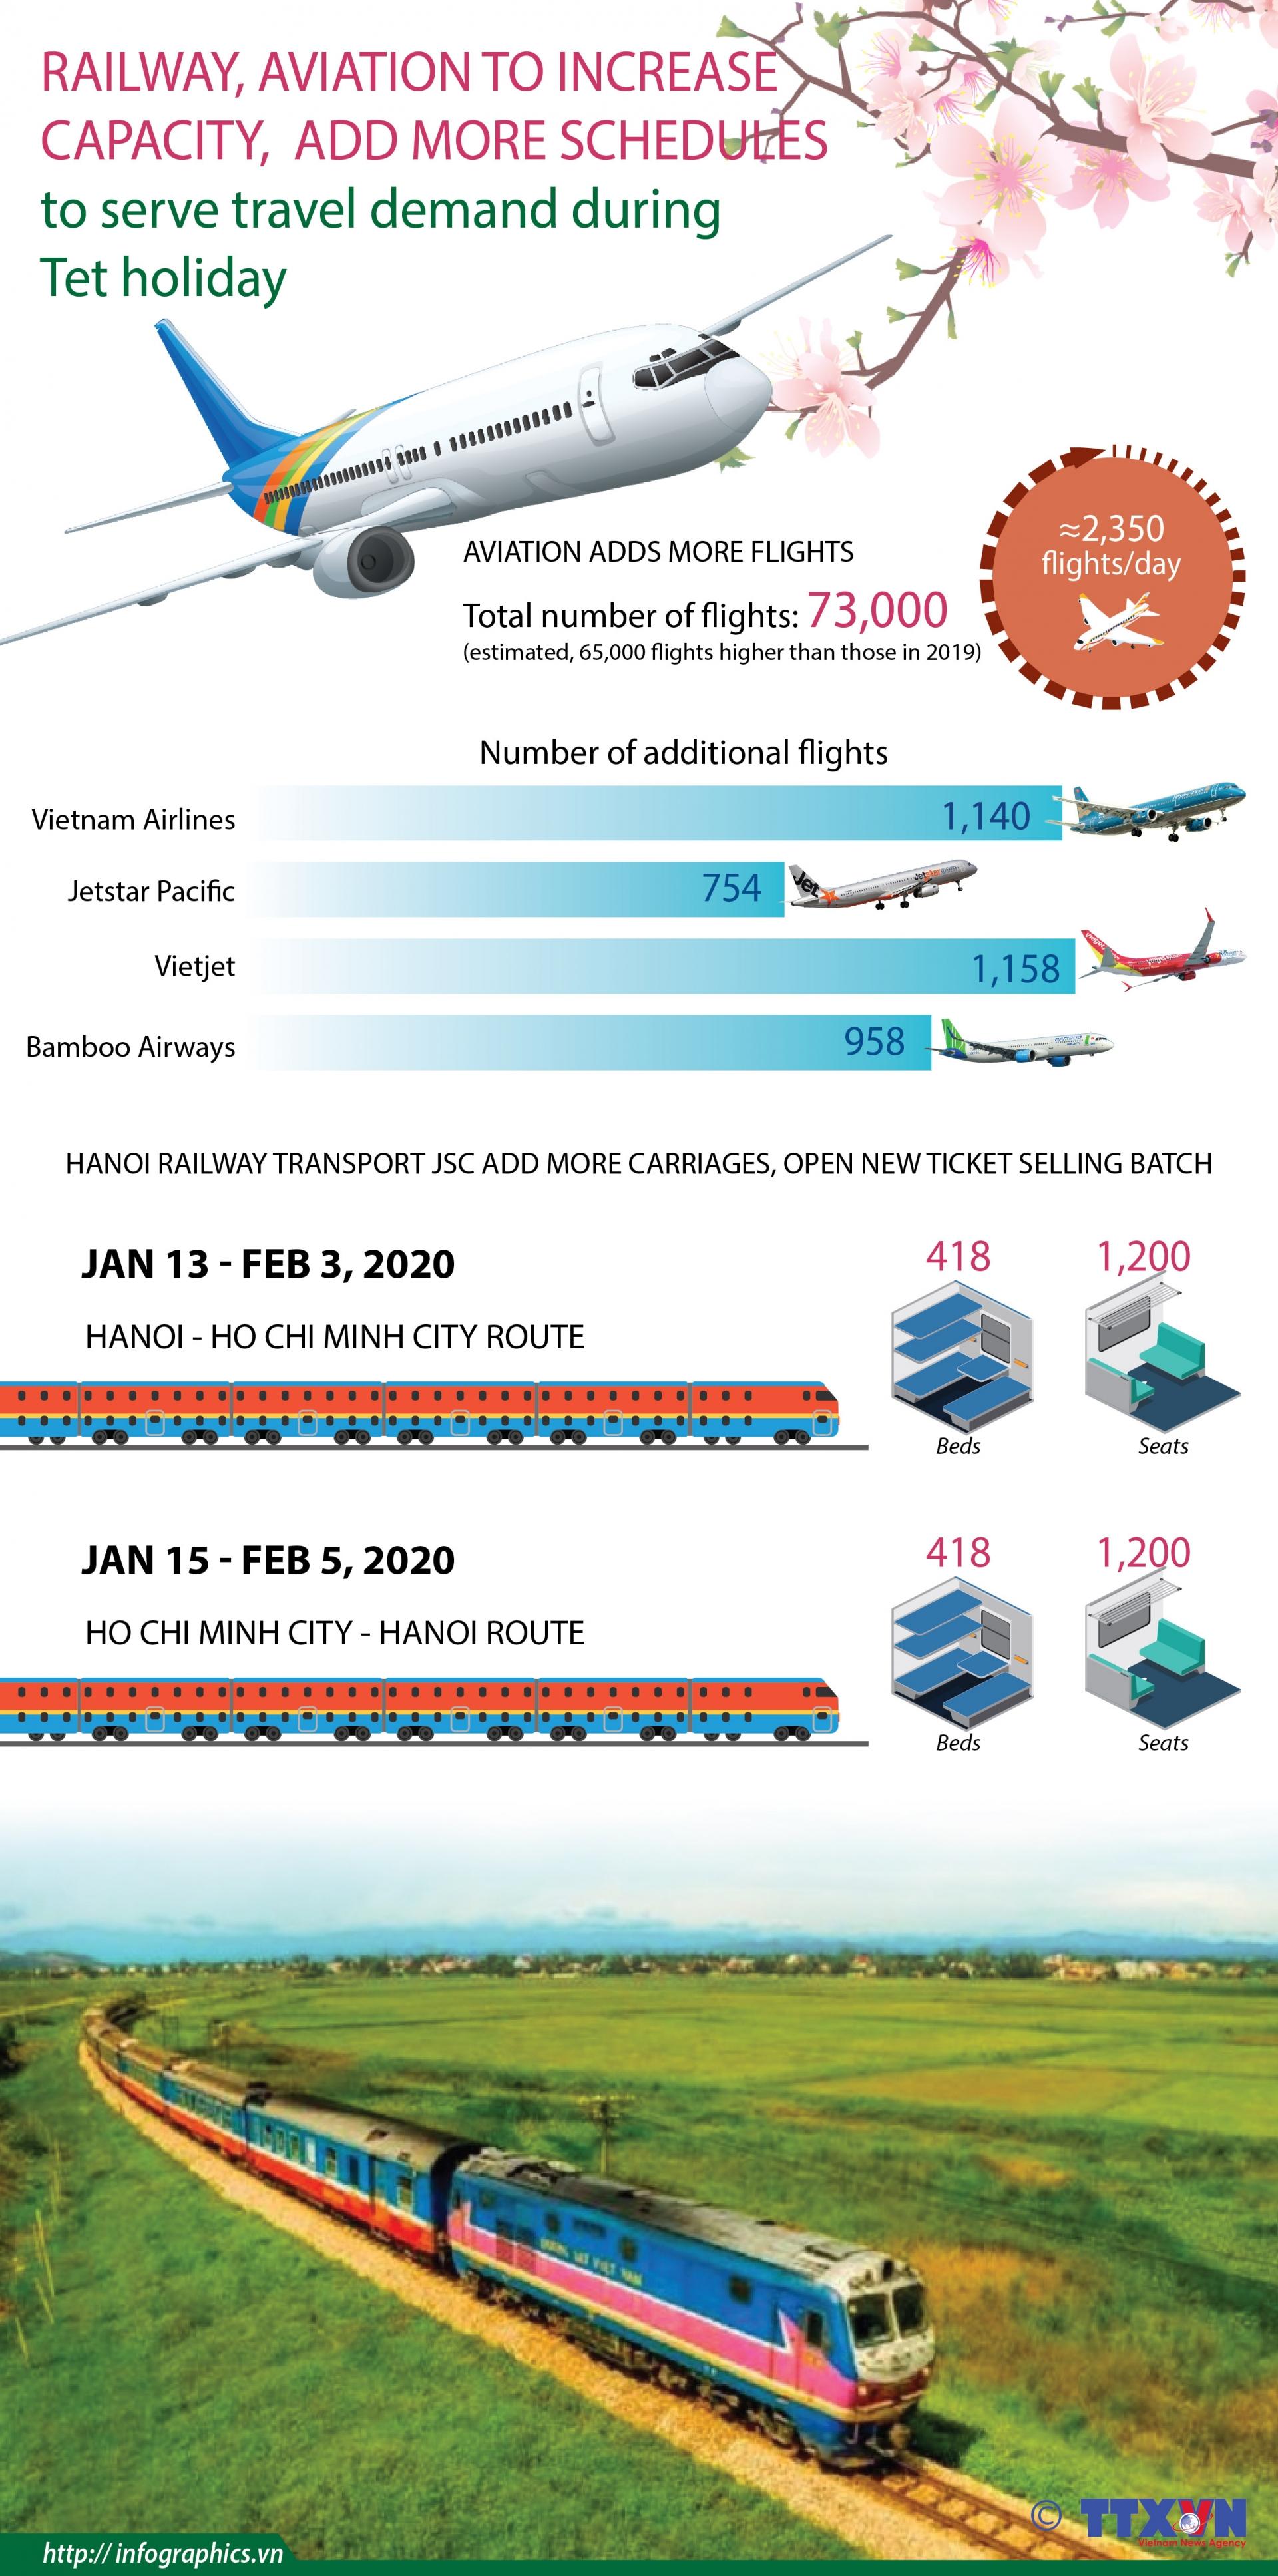 railway aviation to increase capacity to serve tet